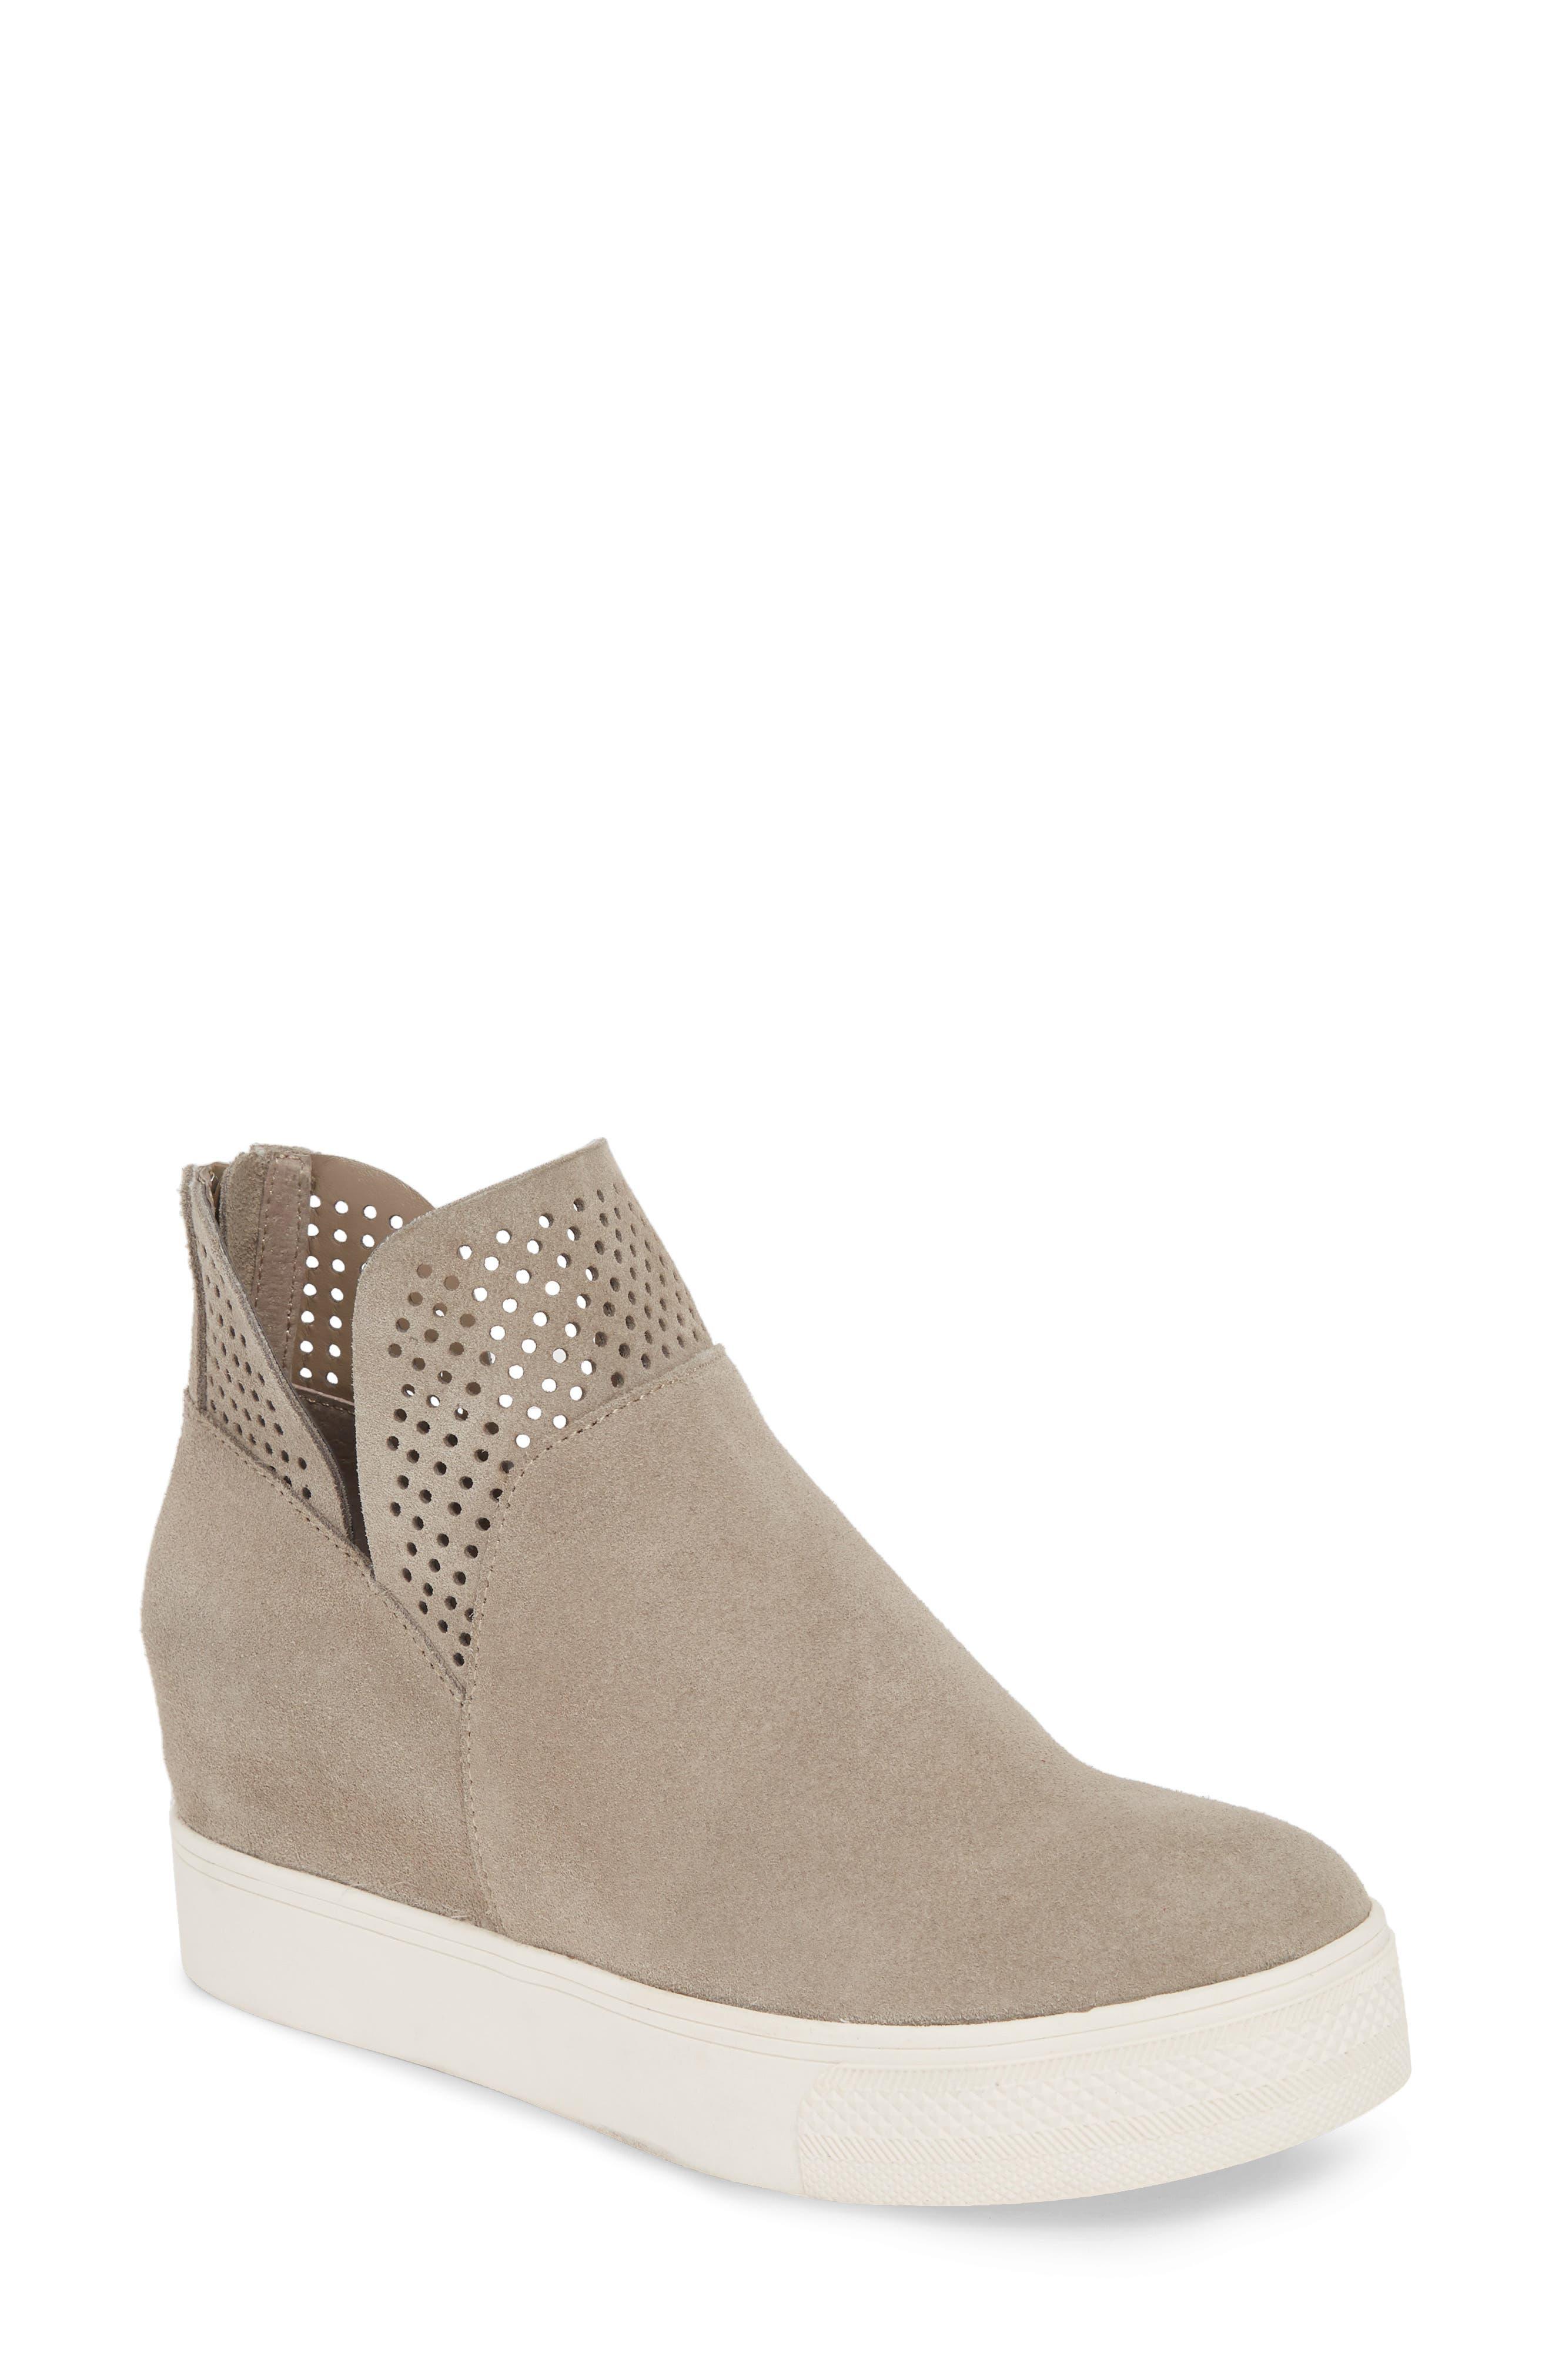 Sneakers & Tennis Shoes for Women Nordstrom Rack    Damskor & löparskor   title=          Nordstrom